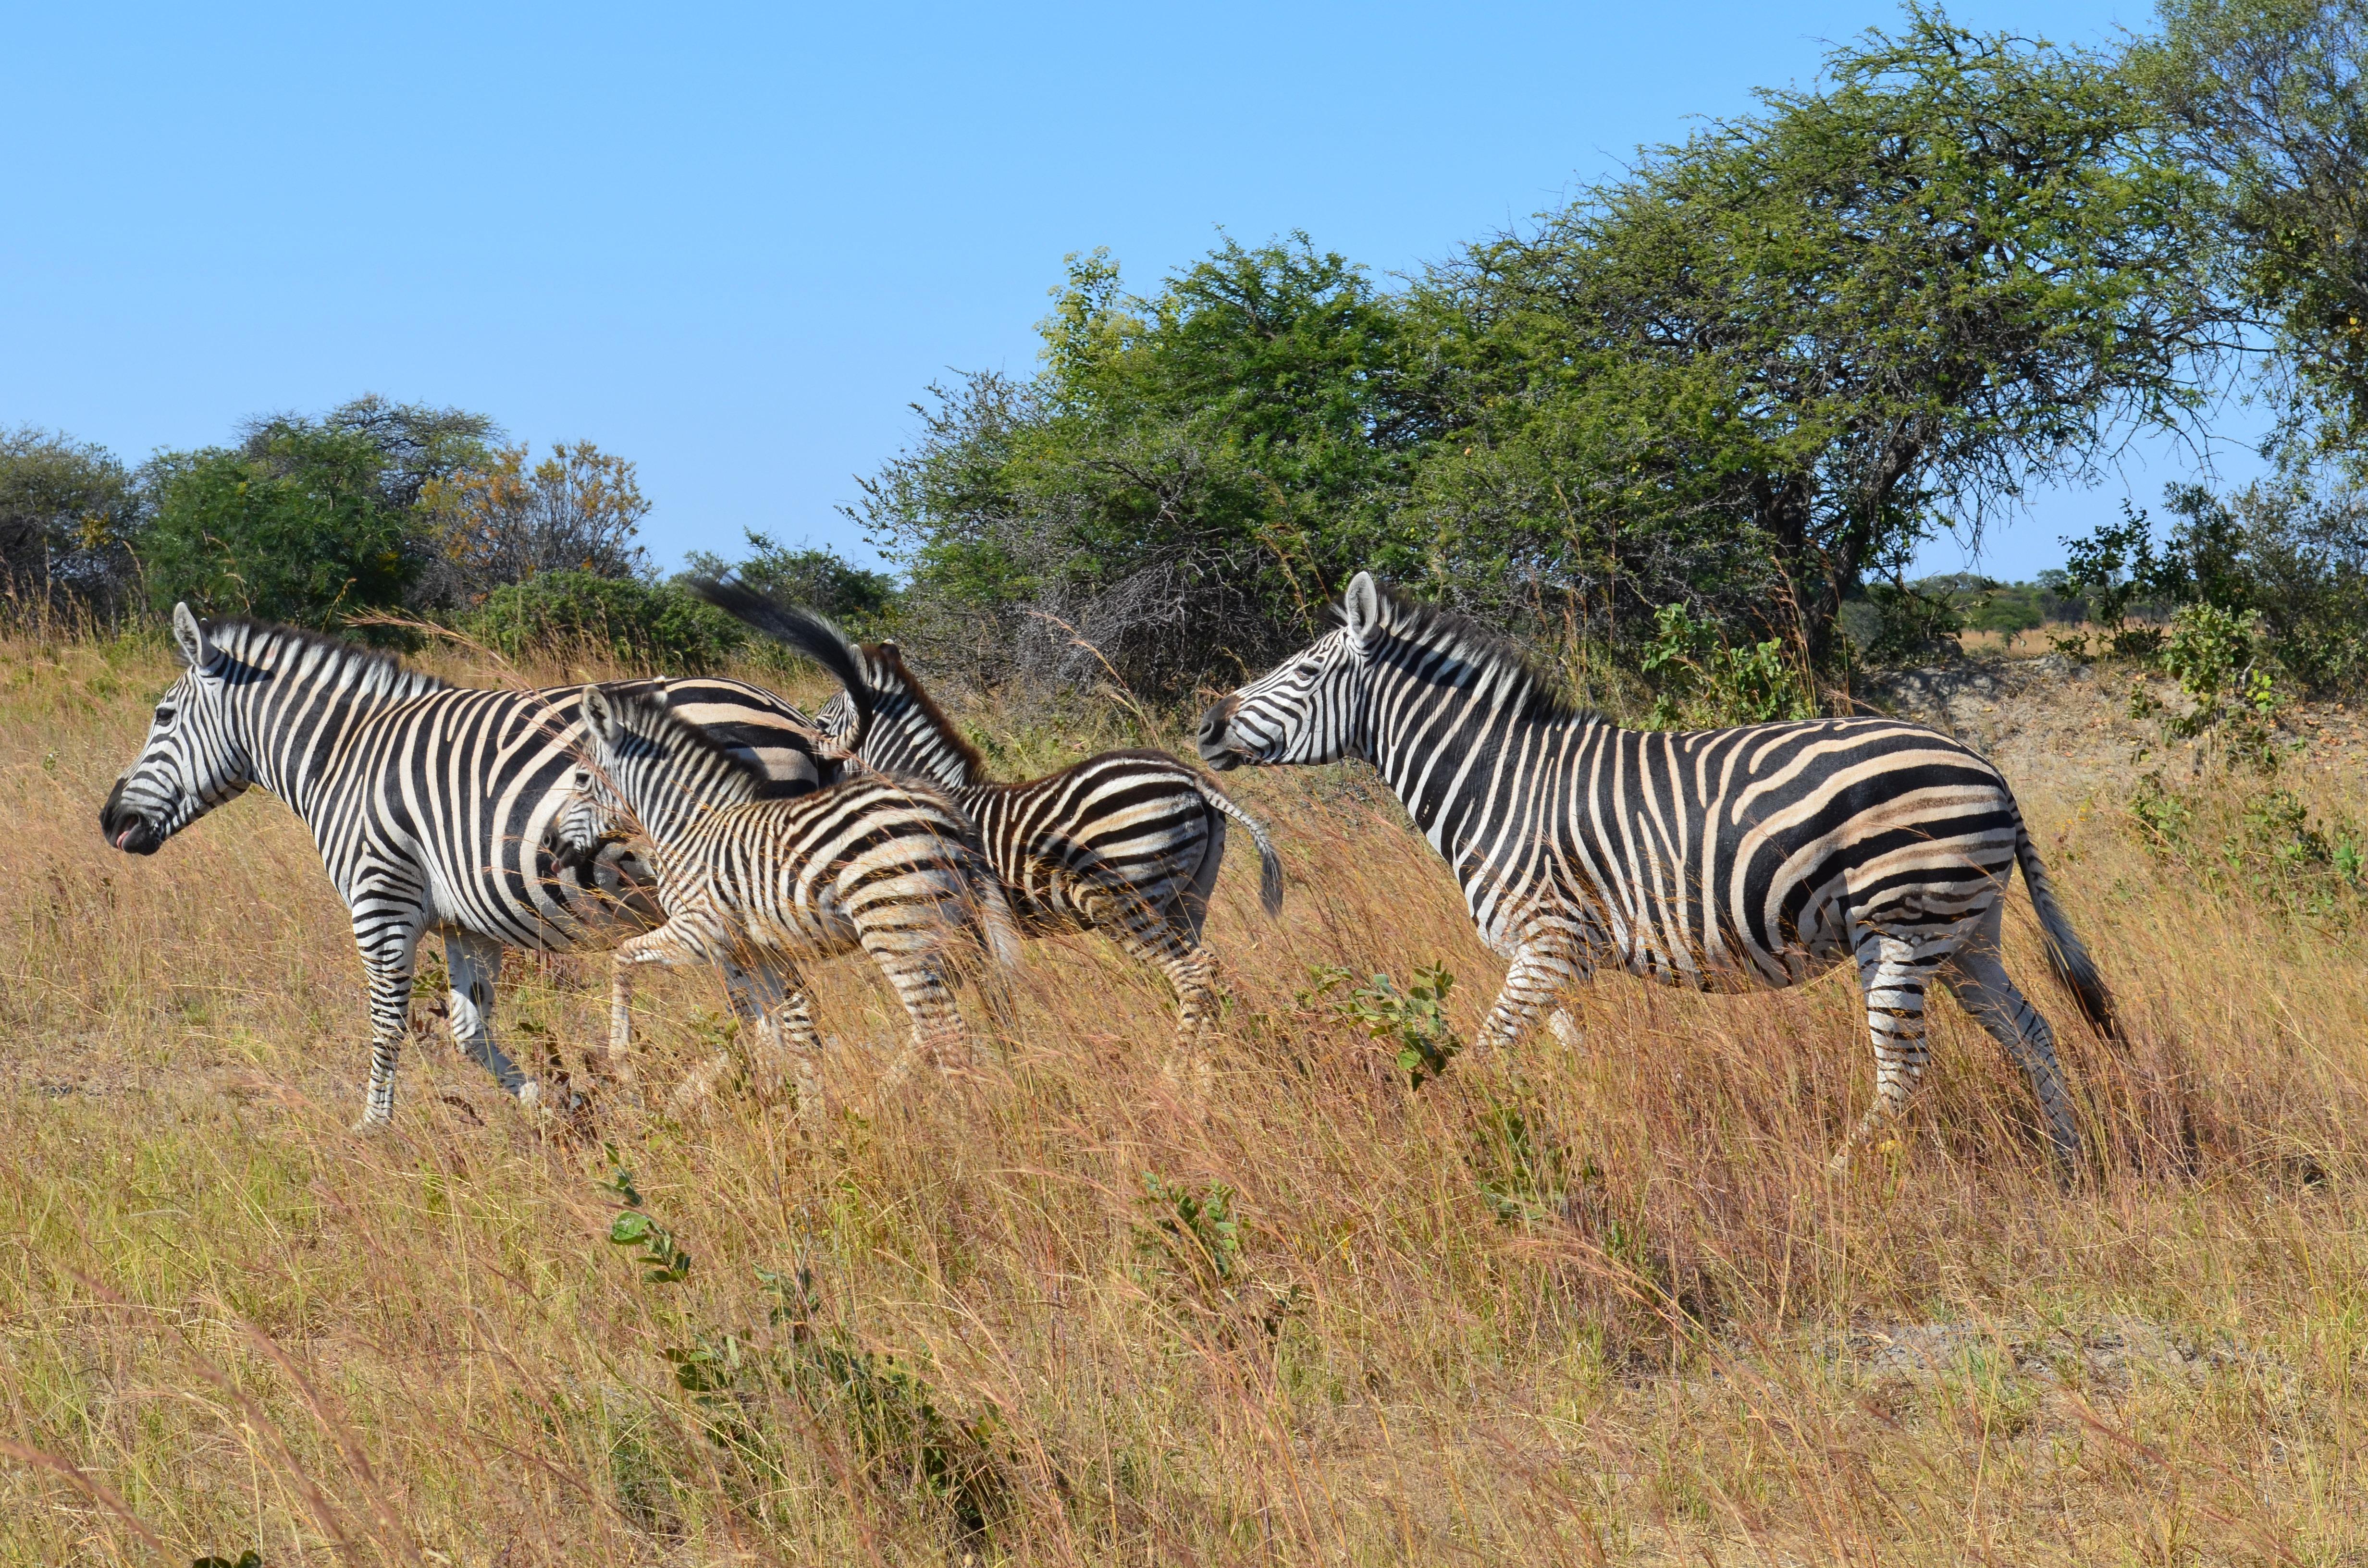 Images gratuites herbe aventure faune sauvage - Images d animaux sauvages gratuites ...